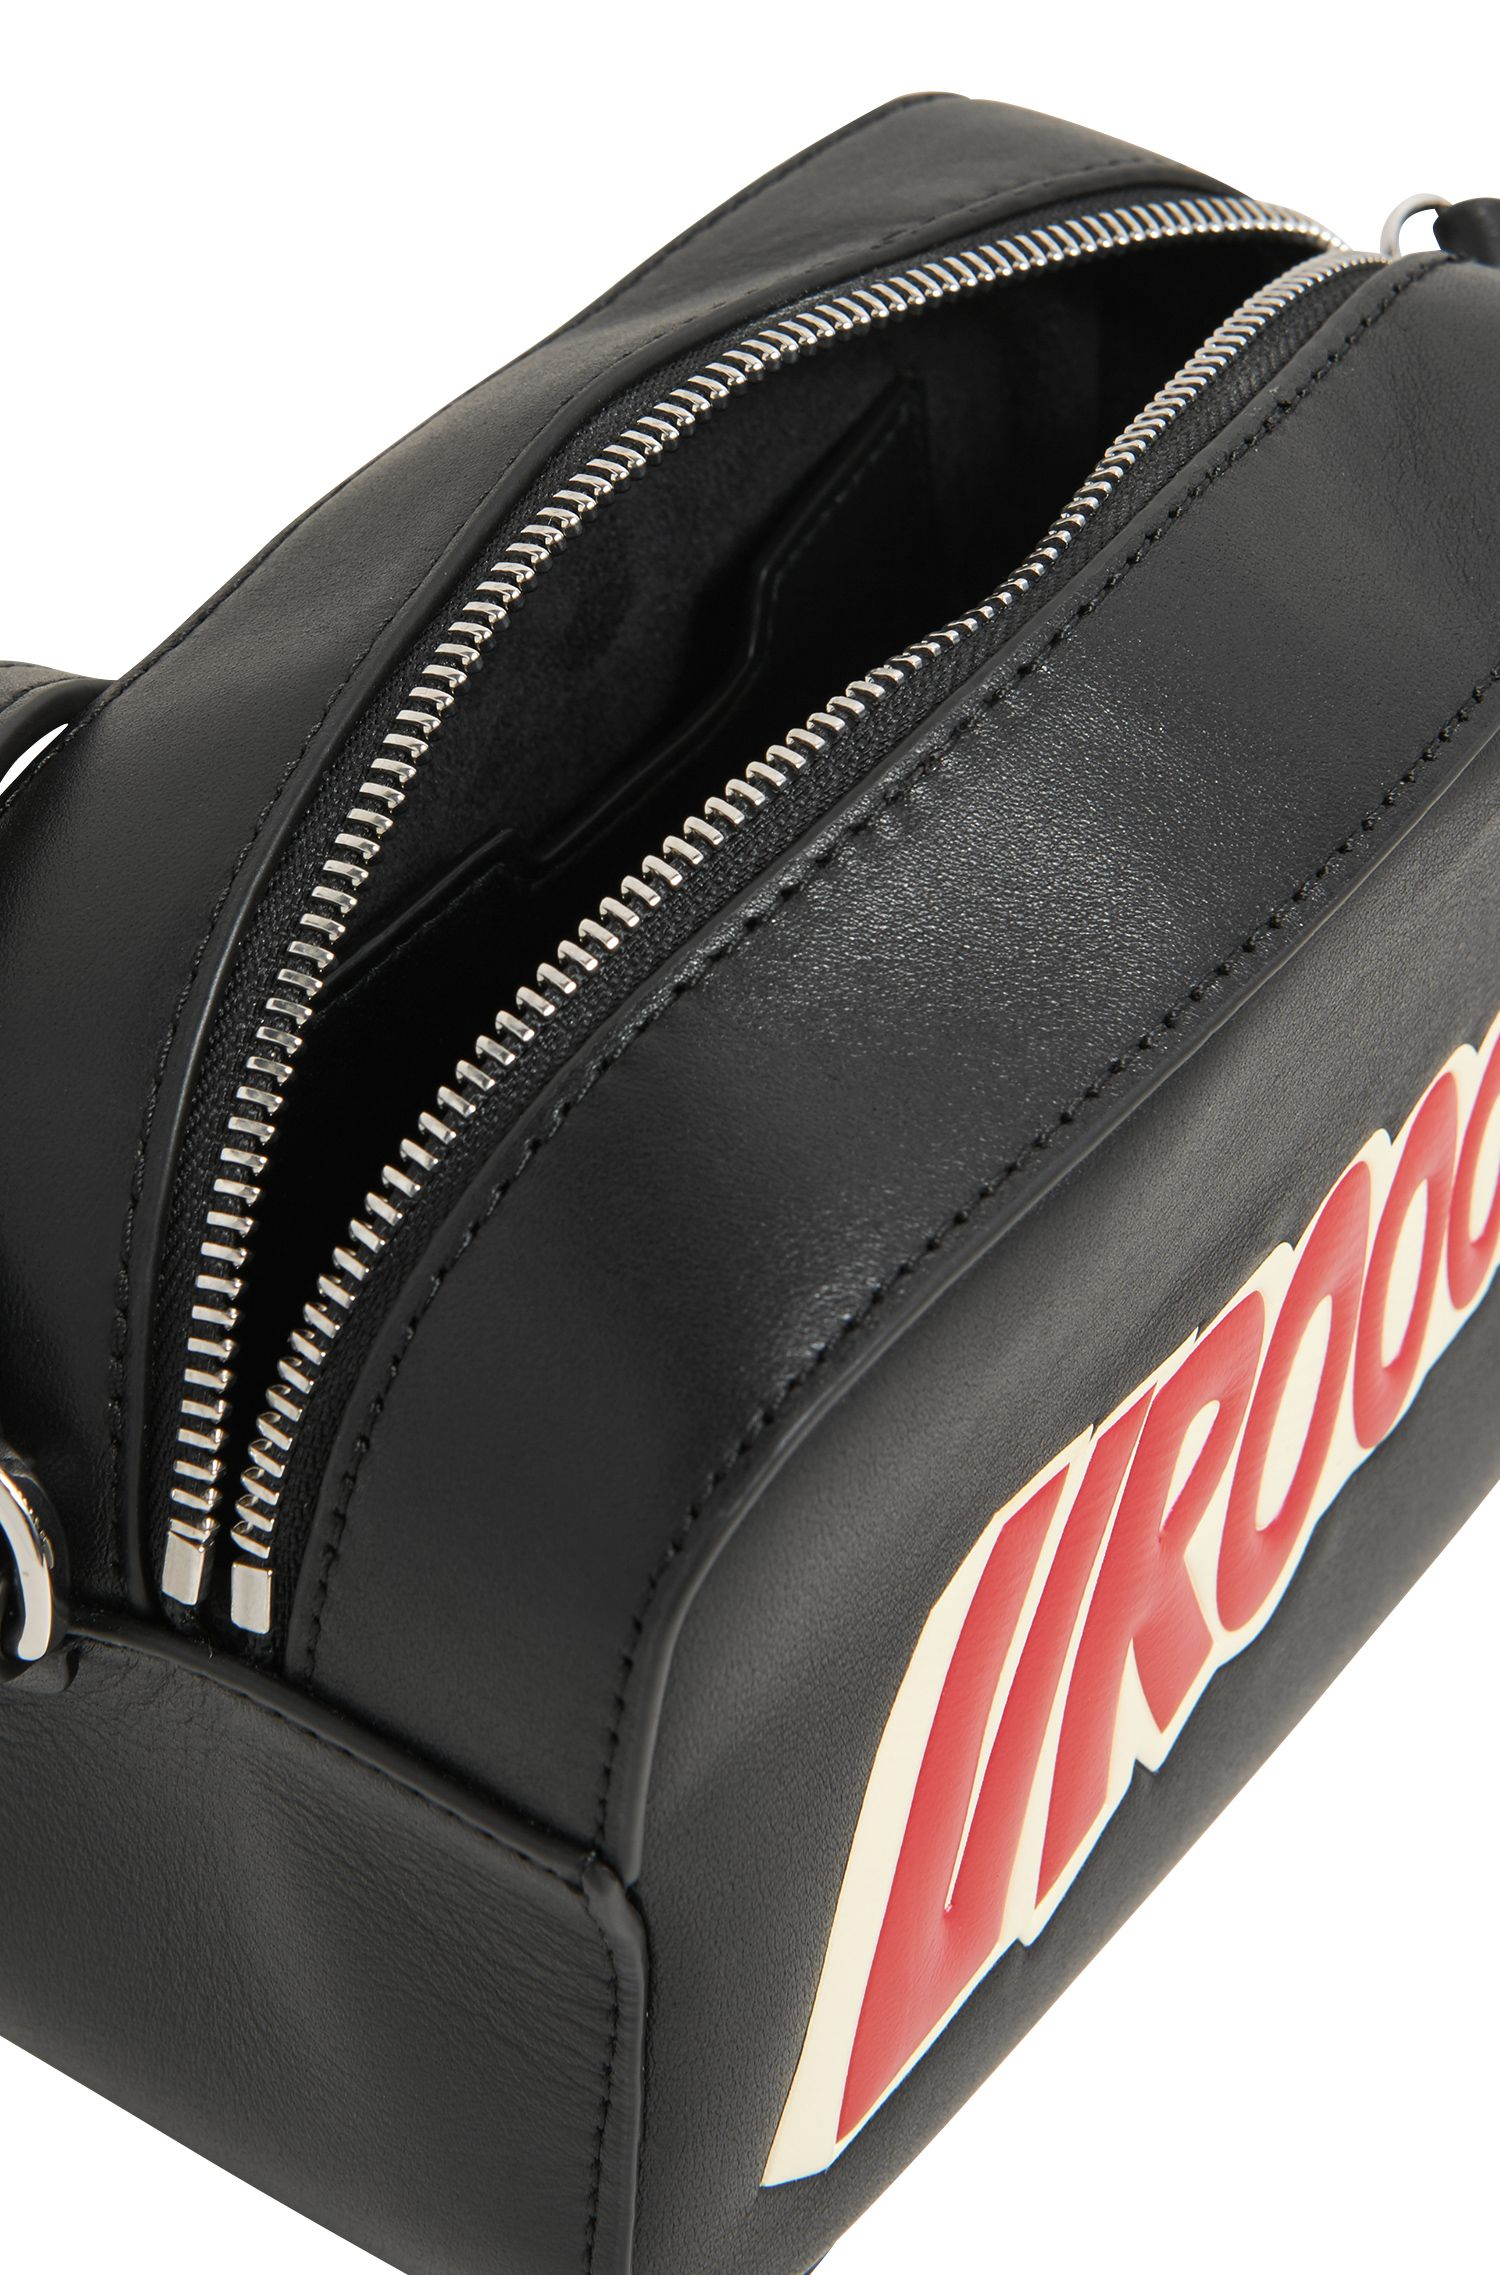 Leather crossbody bag with statement slogan